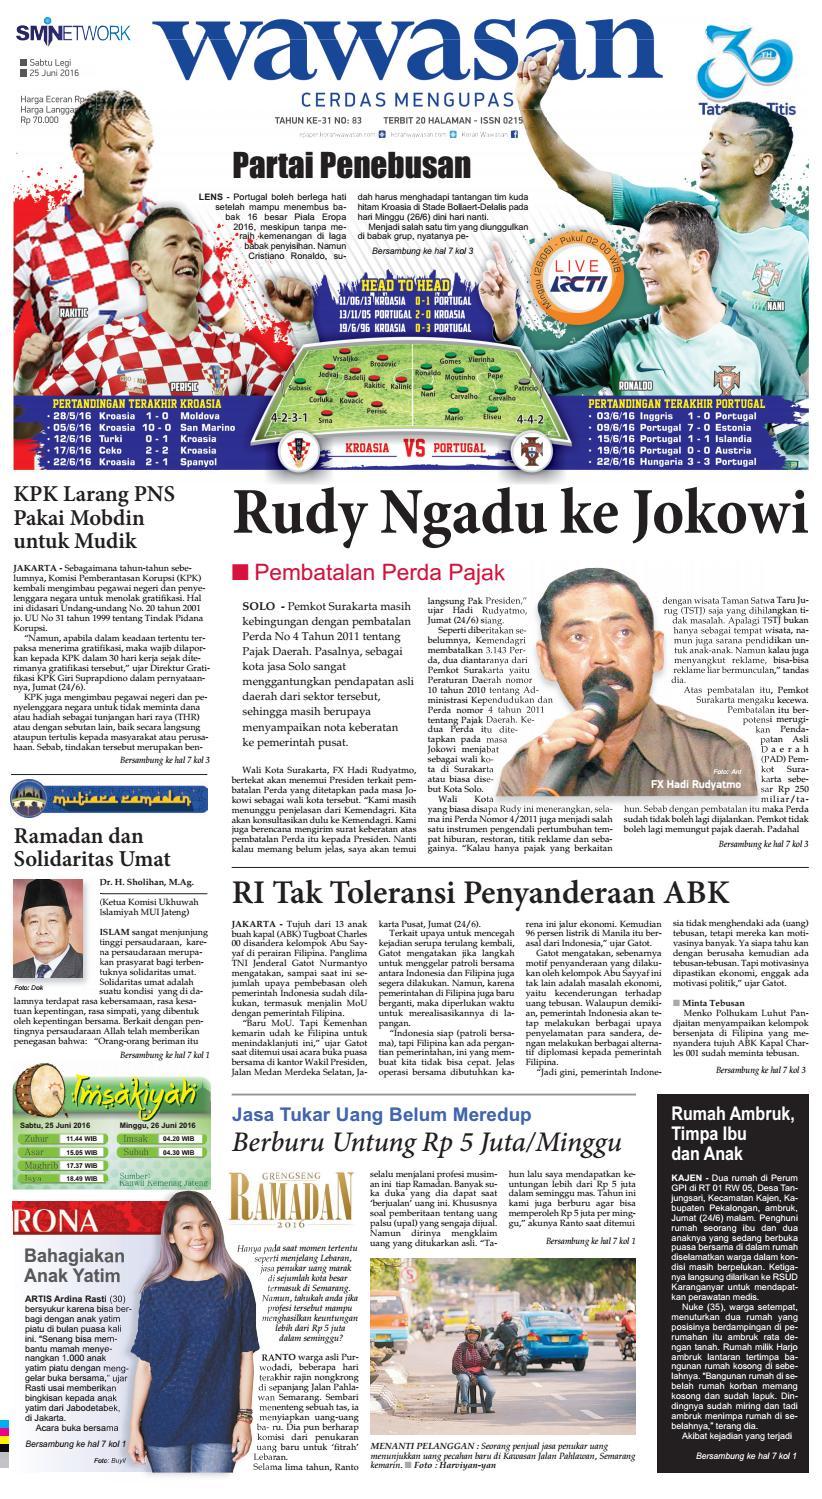 Wawasan 23 Juni 2016 By Koran Pagi Issuu Produk Ukm Bumn Sastra Organdi Biru 25